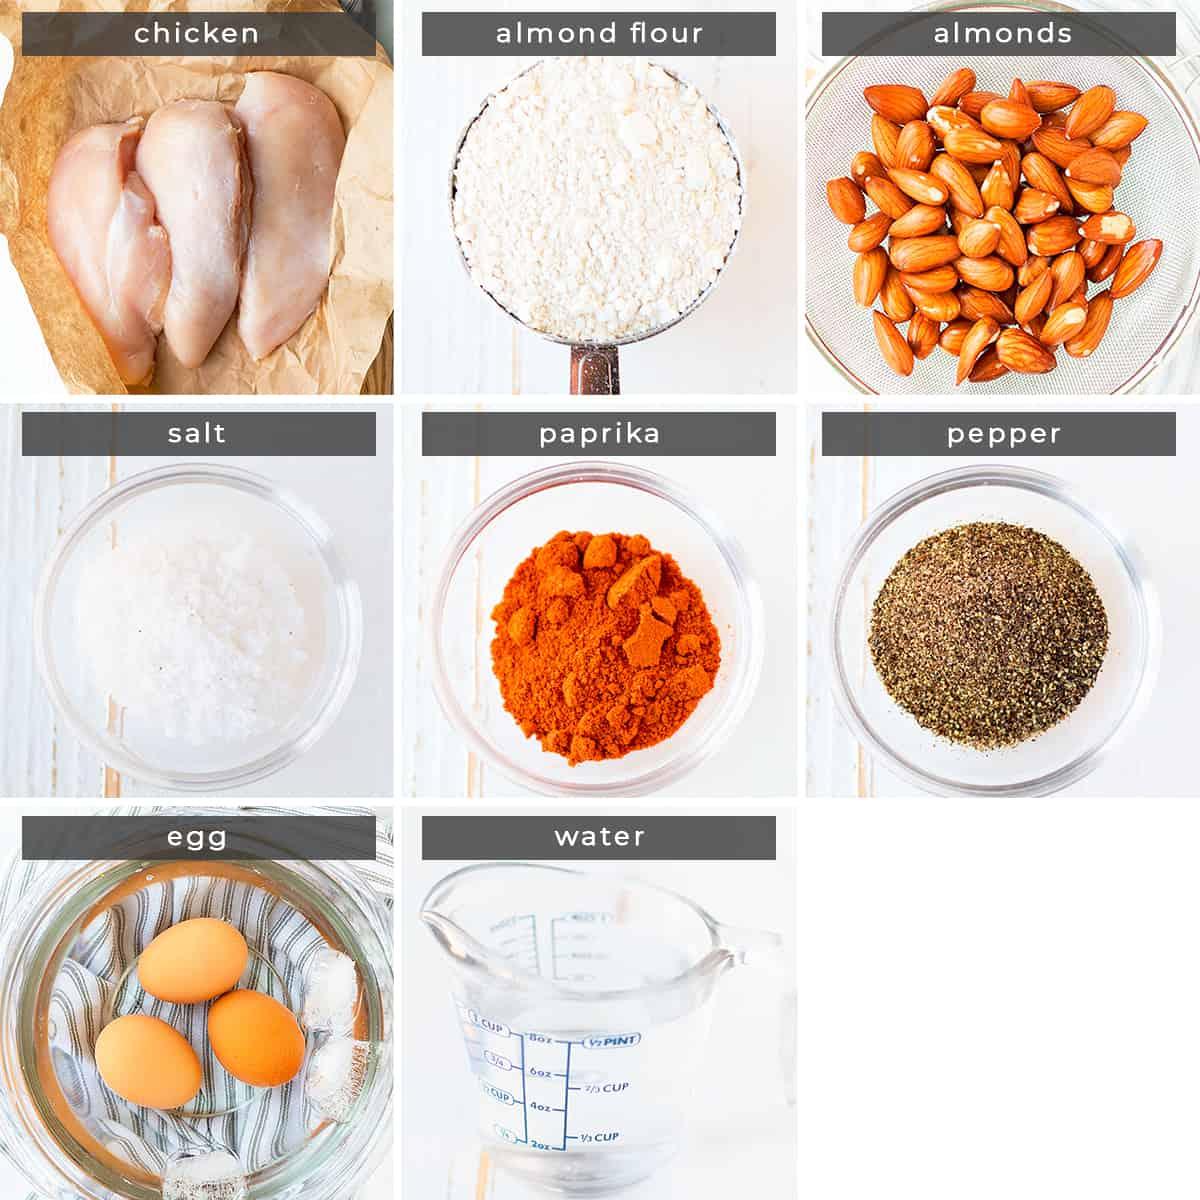 Image containing recipe ingredients chicken, almond flour, almonds, salt, paprika, pepper, egg, water.